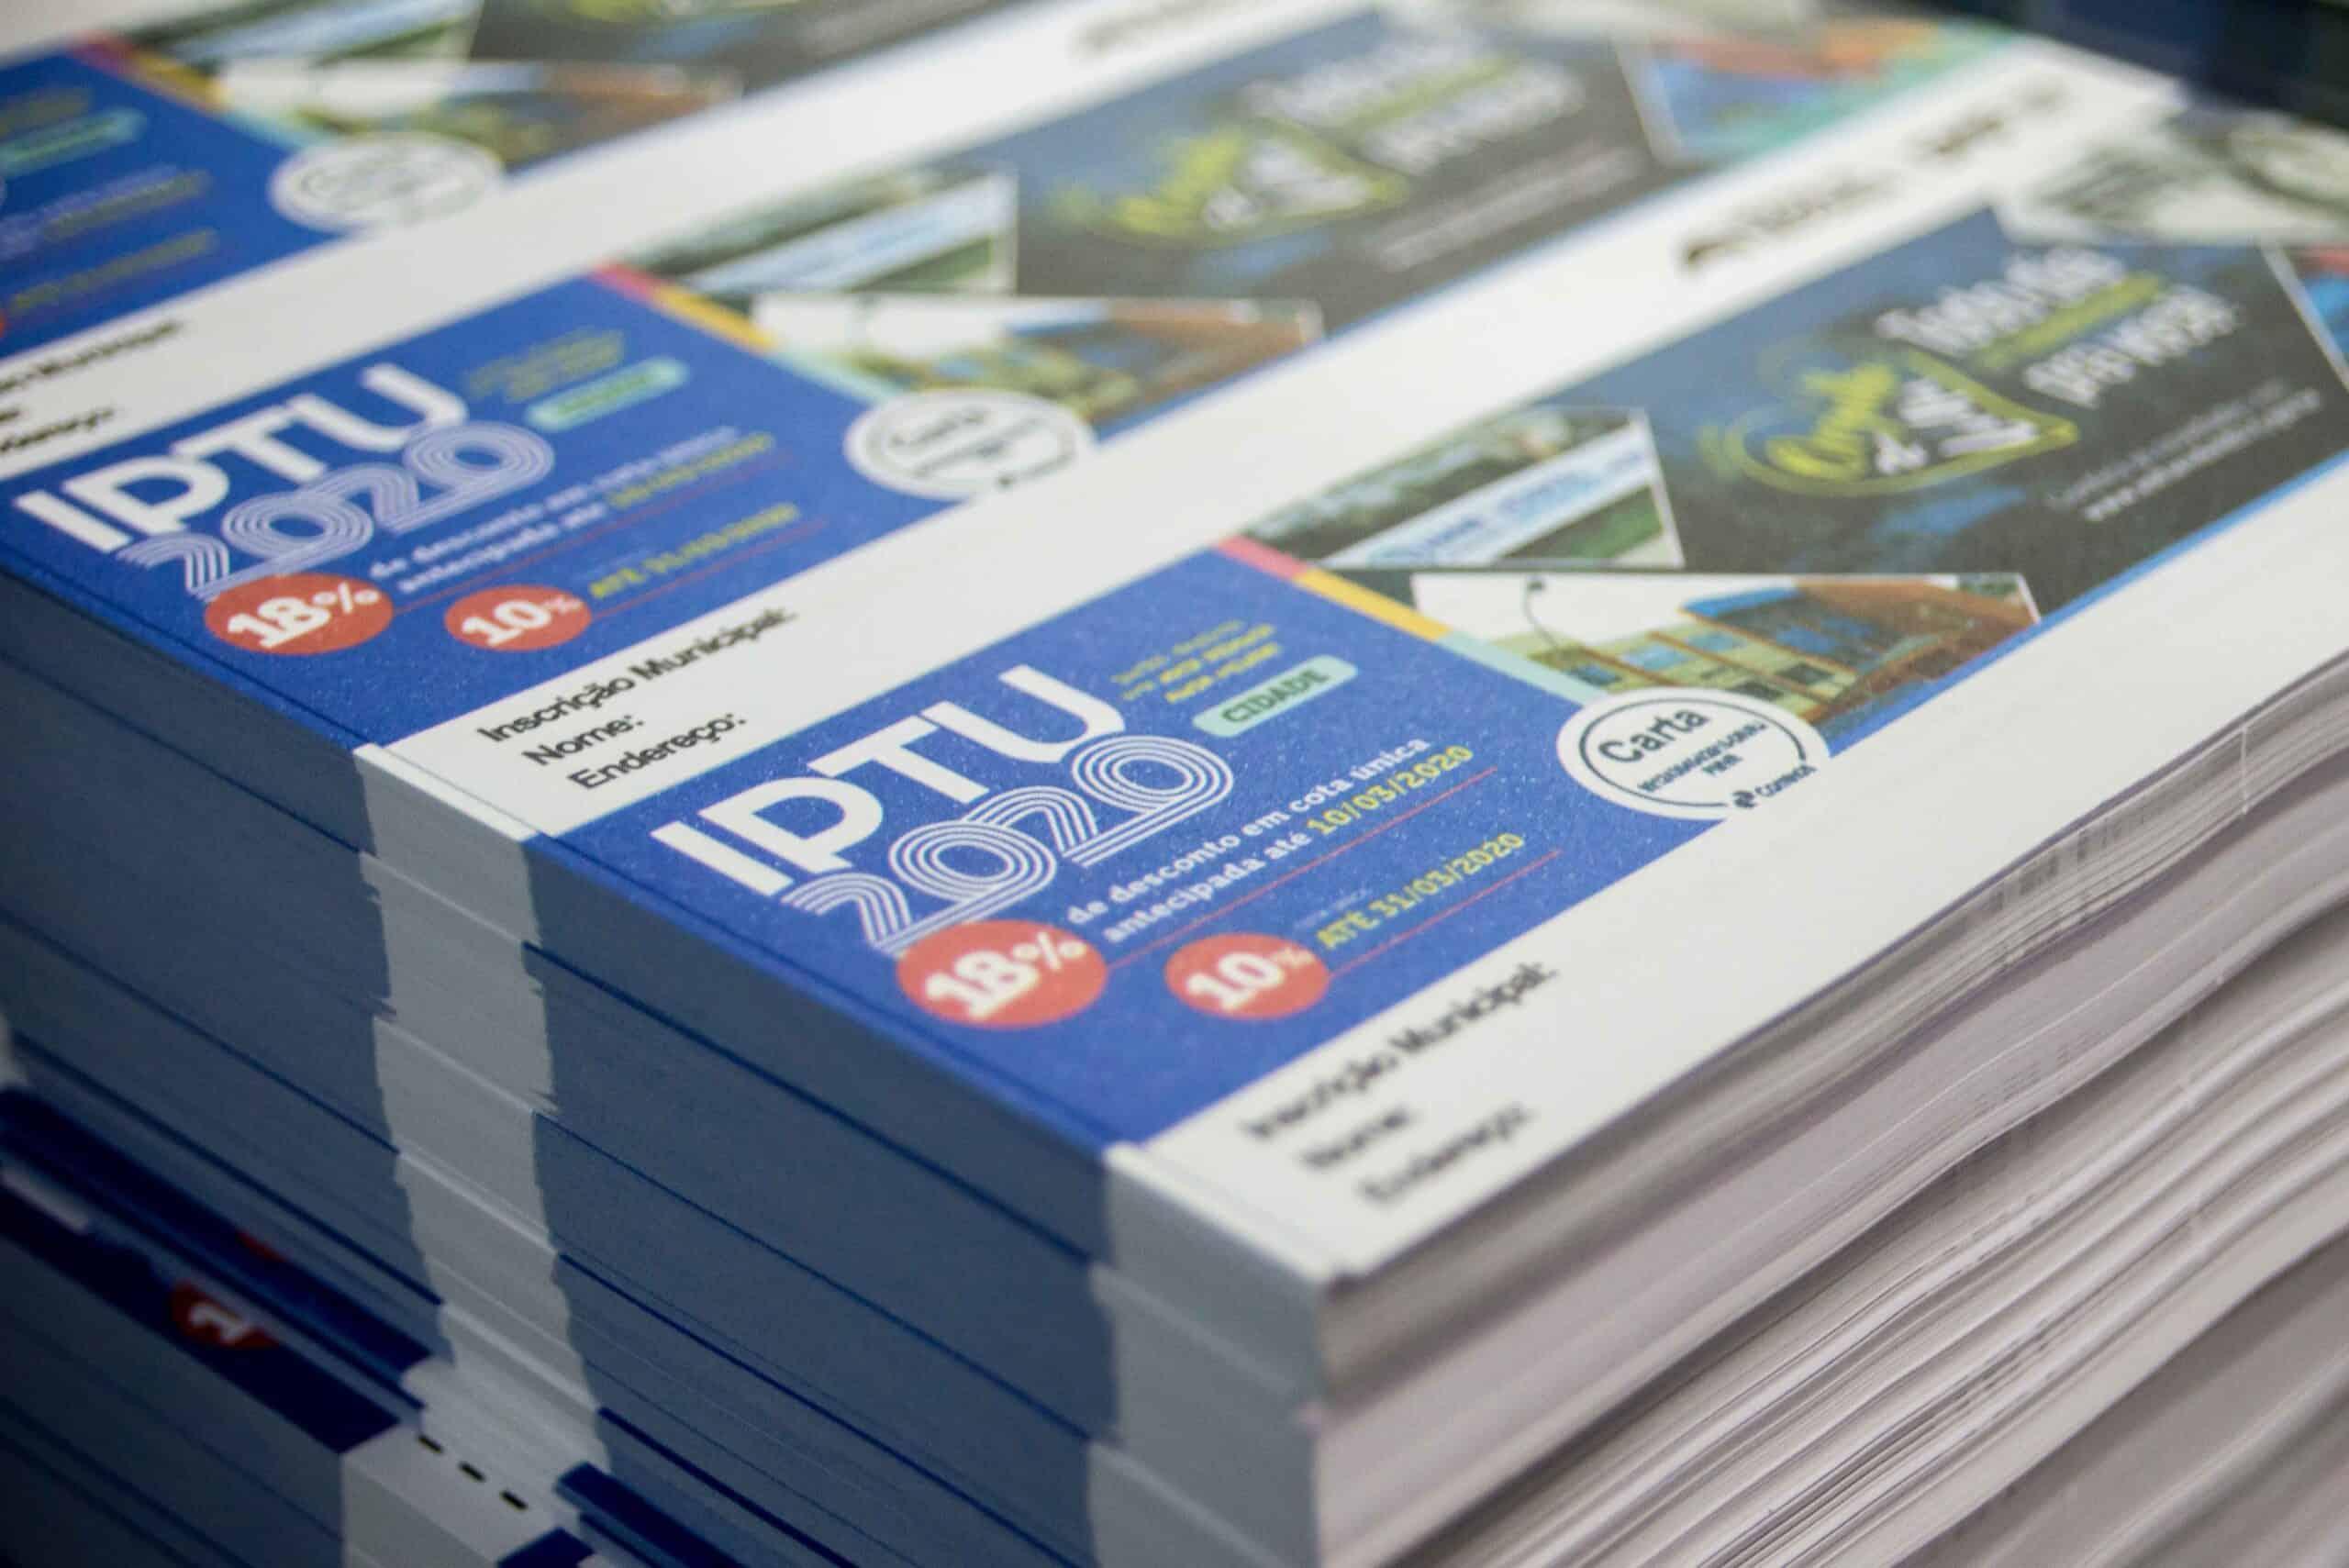 IPTU 2021: Volta Redonda distribuí requerimento para desconto de 50% no imposto